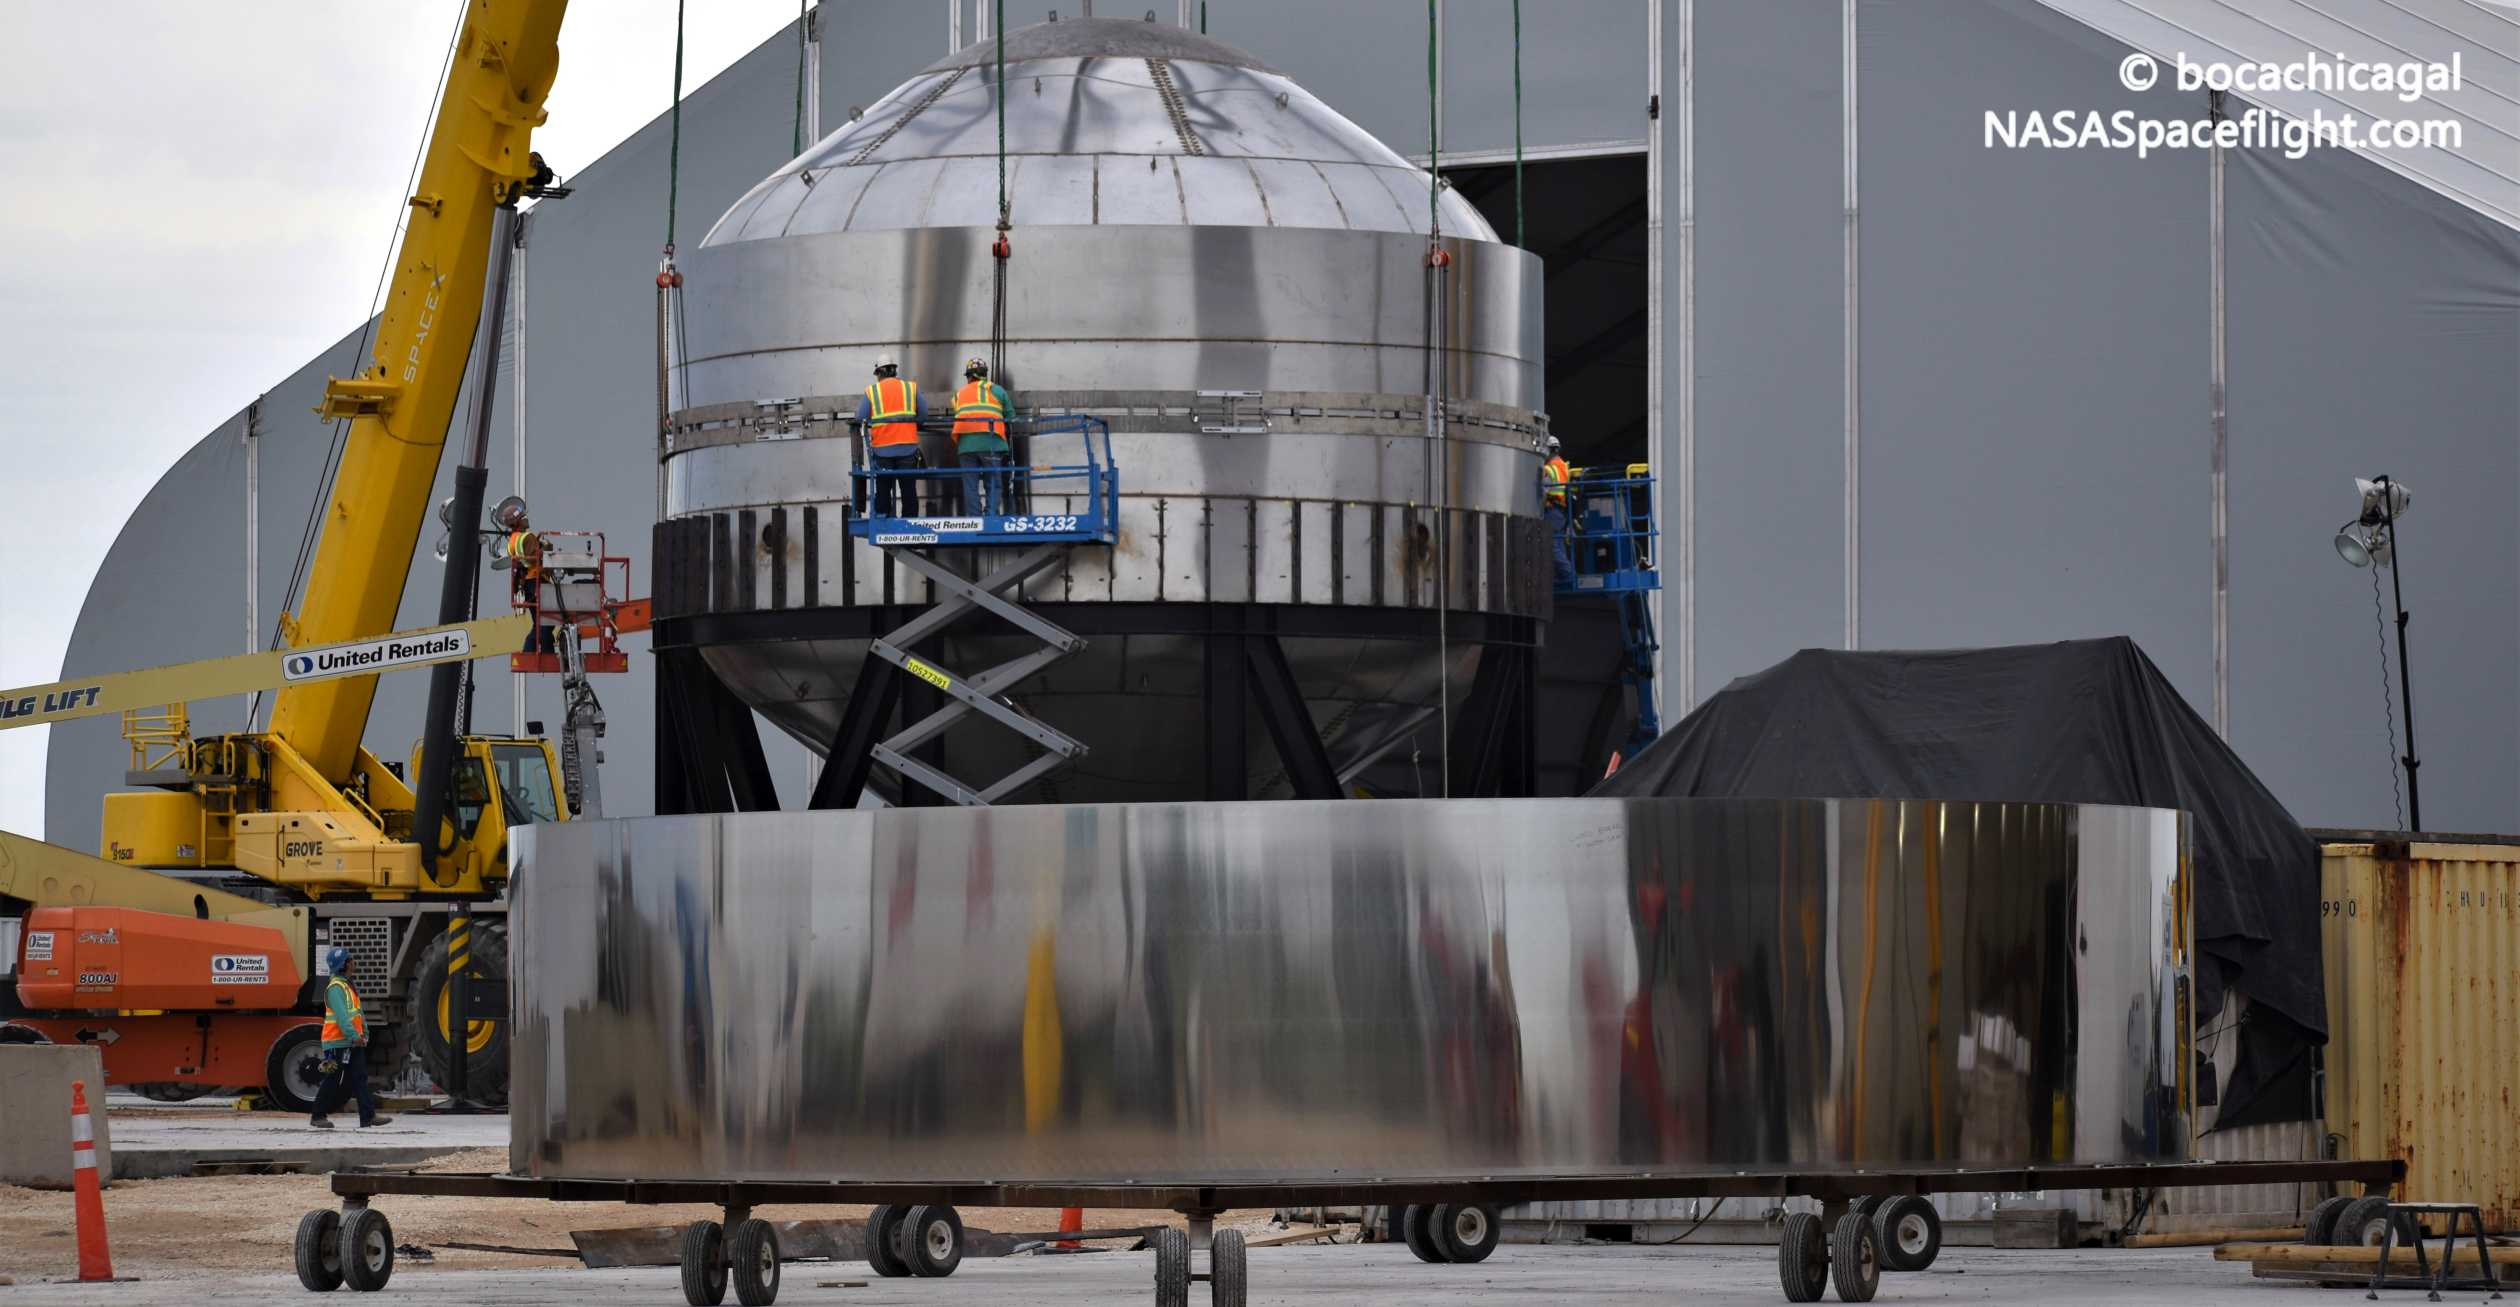 Starship Boca Chica 012620 (NASASpaceflight – bocachicagal) test tank #2 2 crop (c)